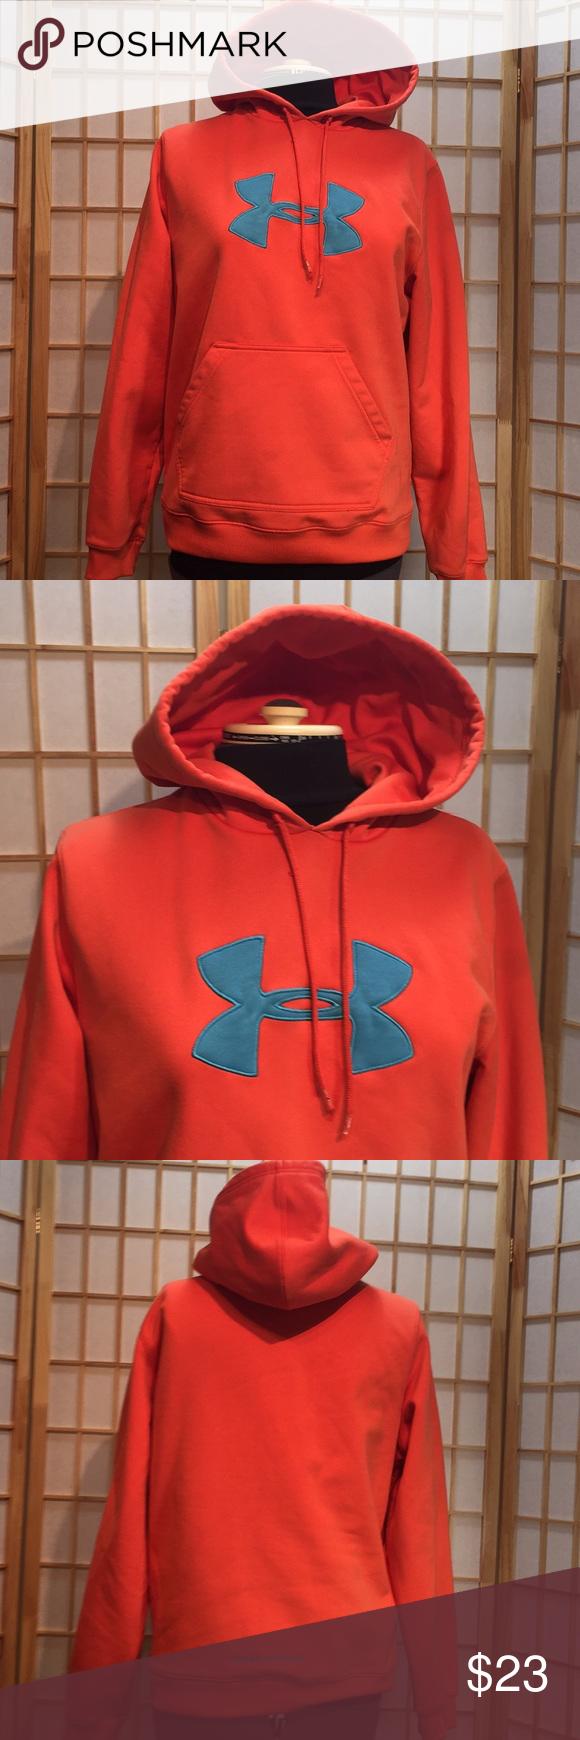 Under Armour Hoodie Orange Under Armour Hoodie Clothes Design Under Armour [ 1740 x 580 Pixel ]